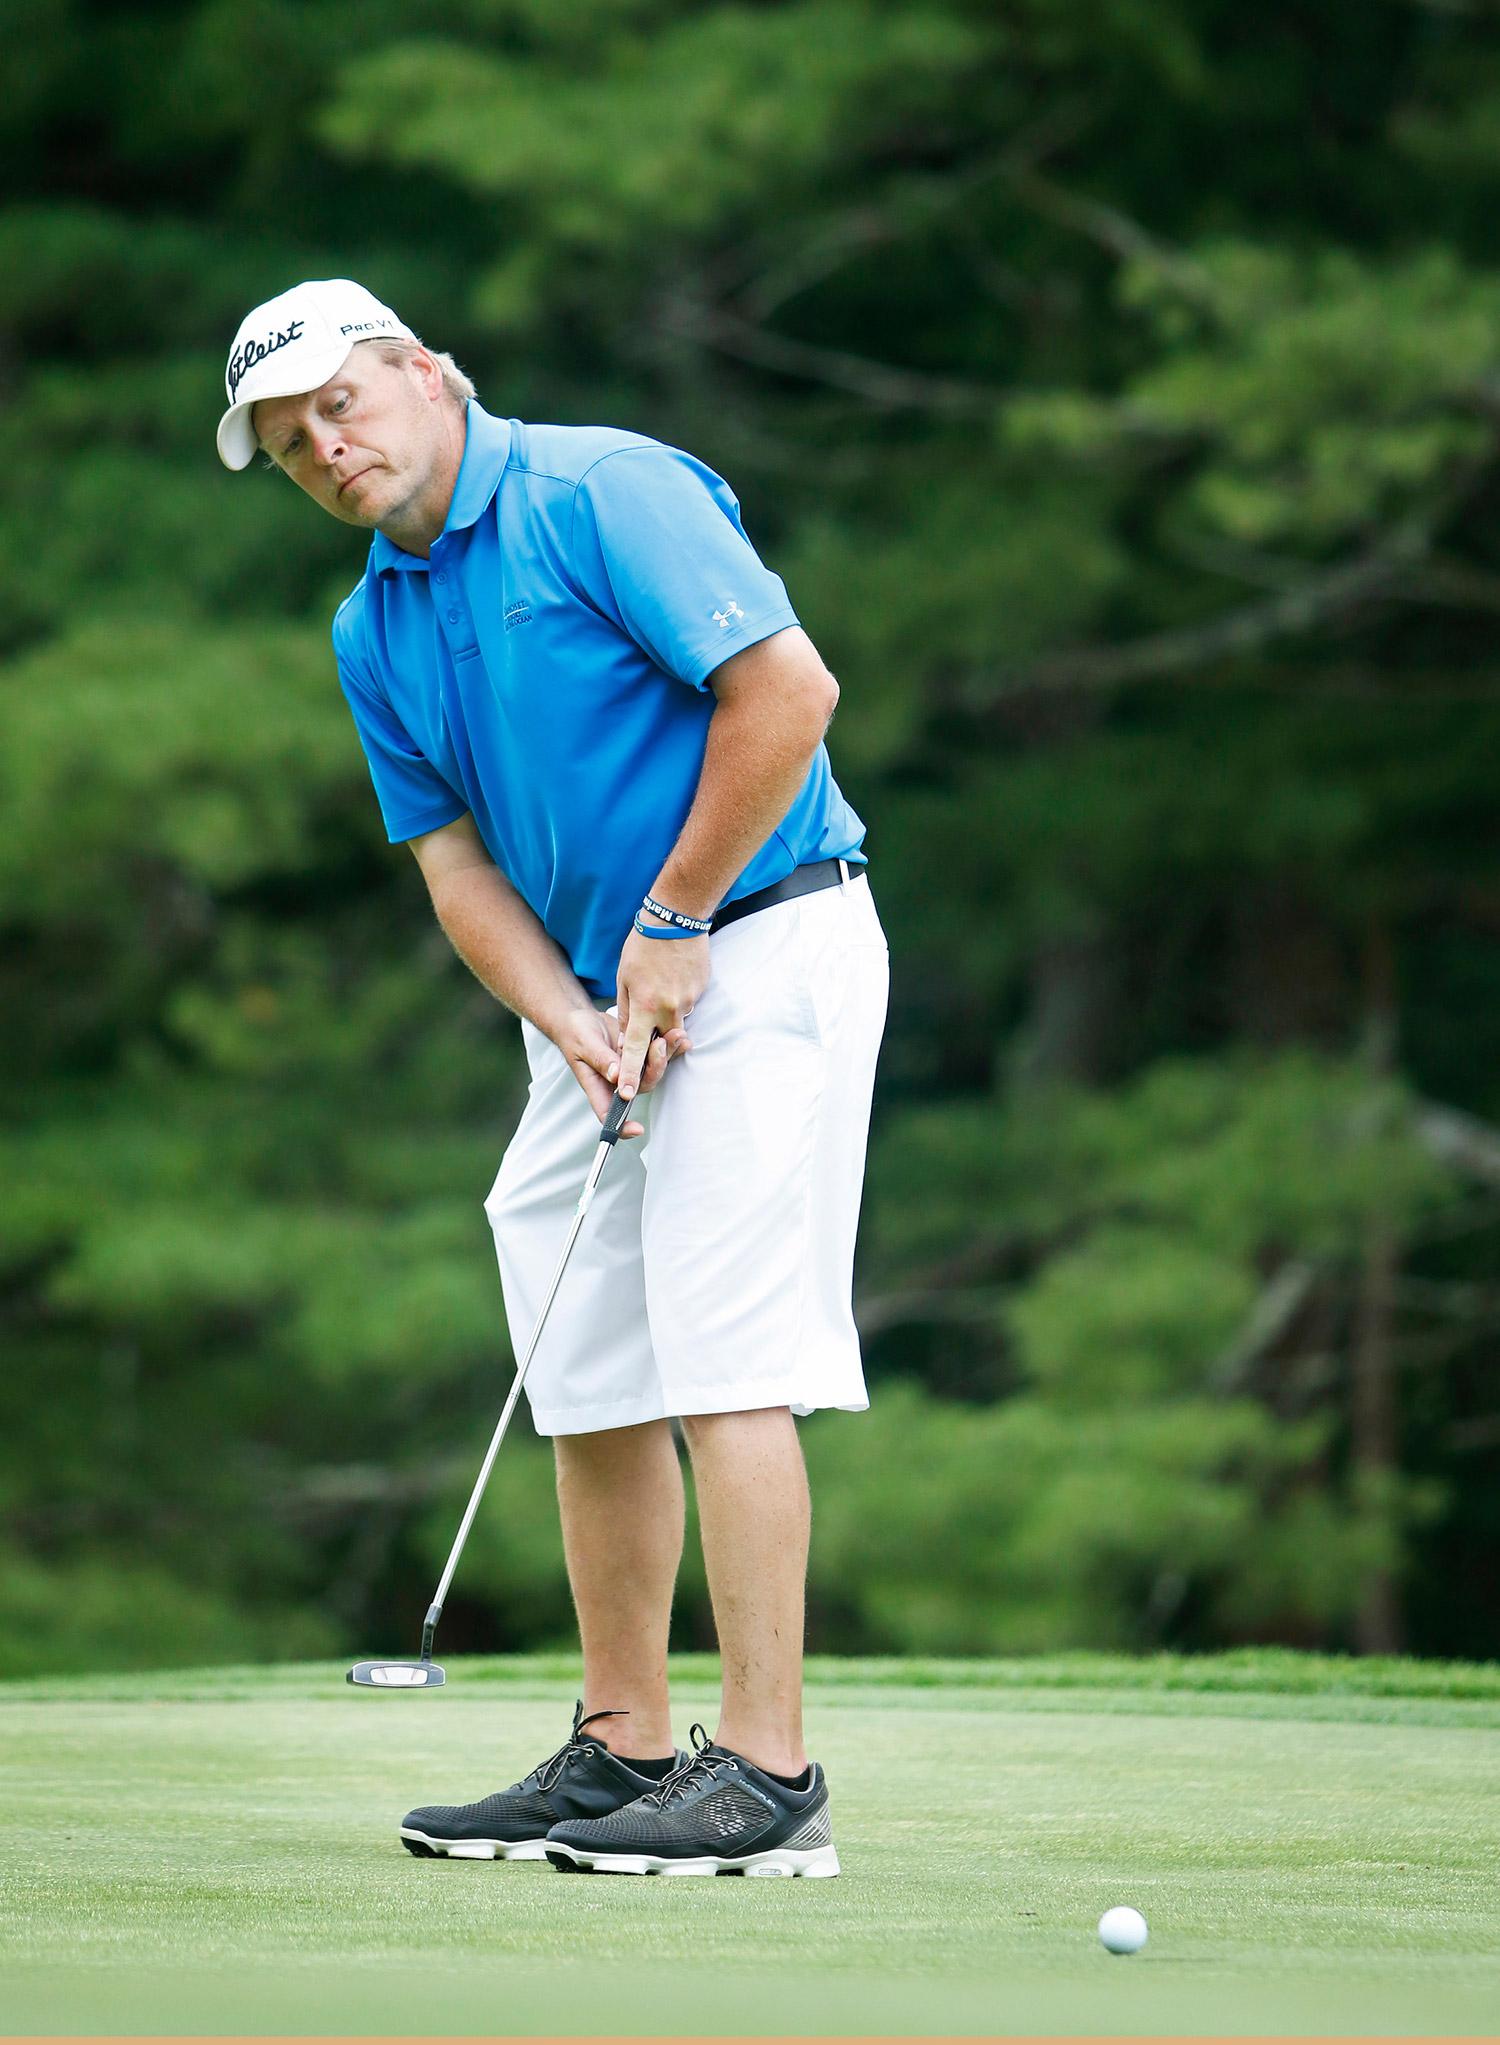 Baker amateur golf tournament